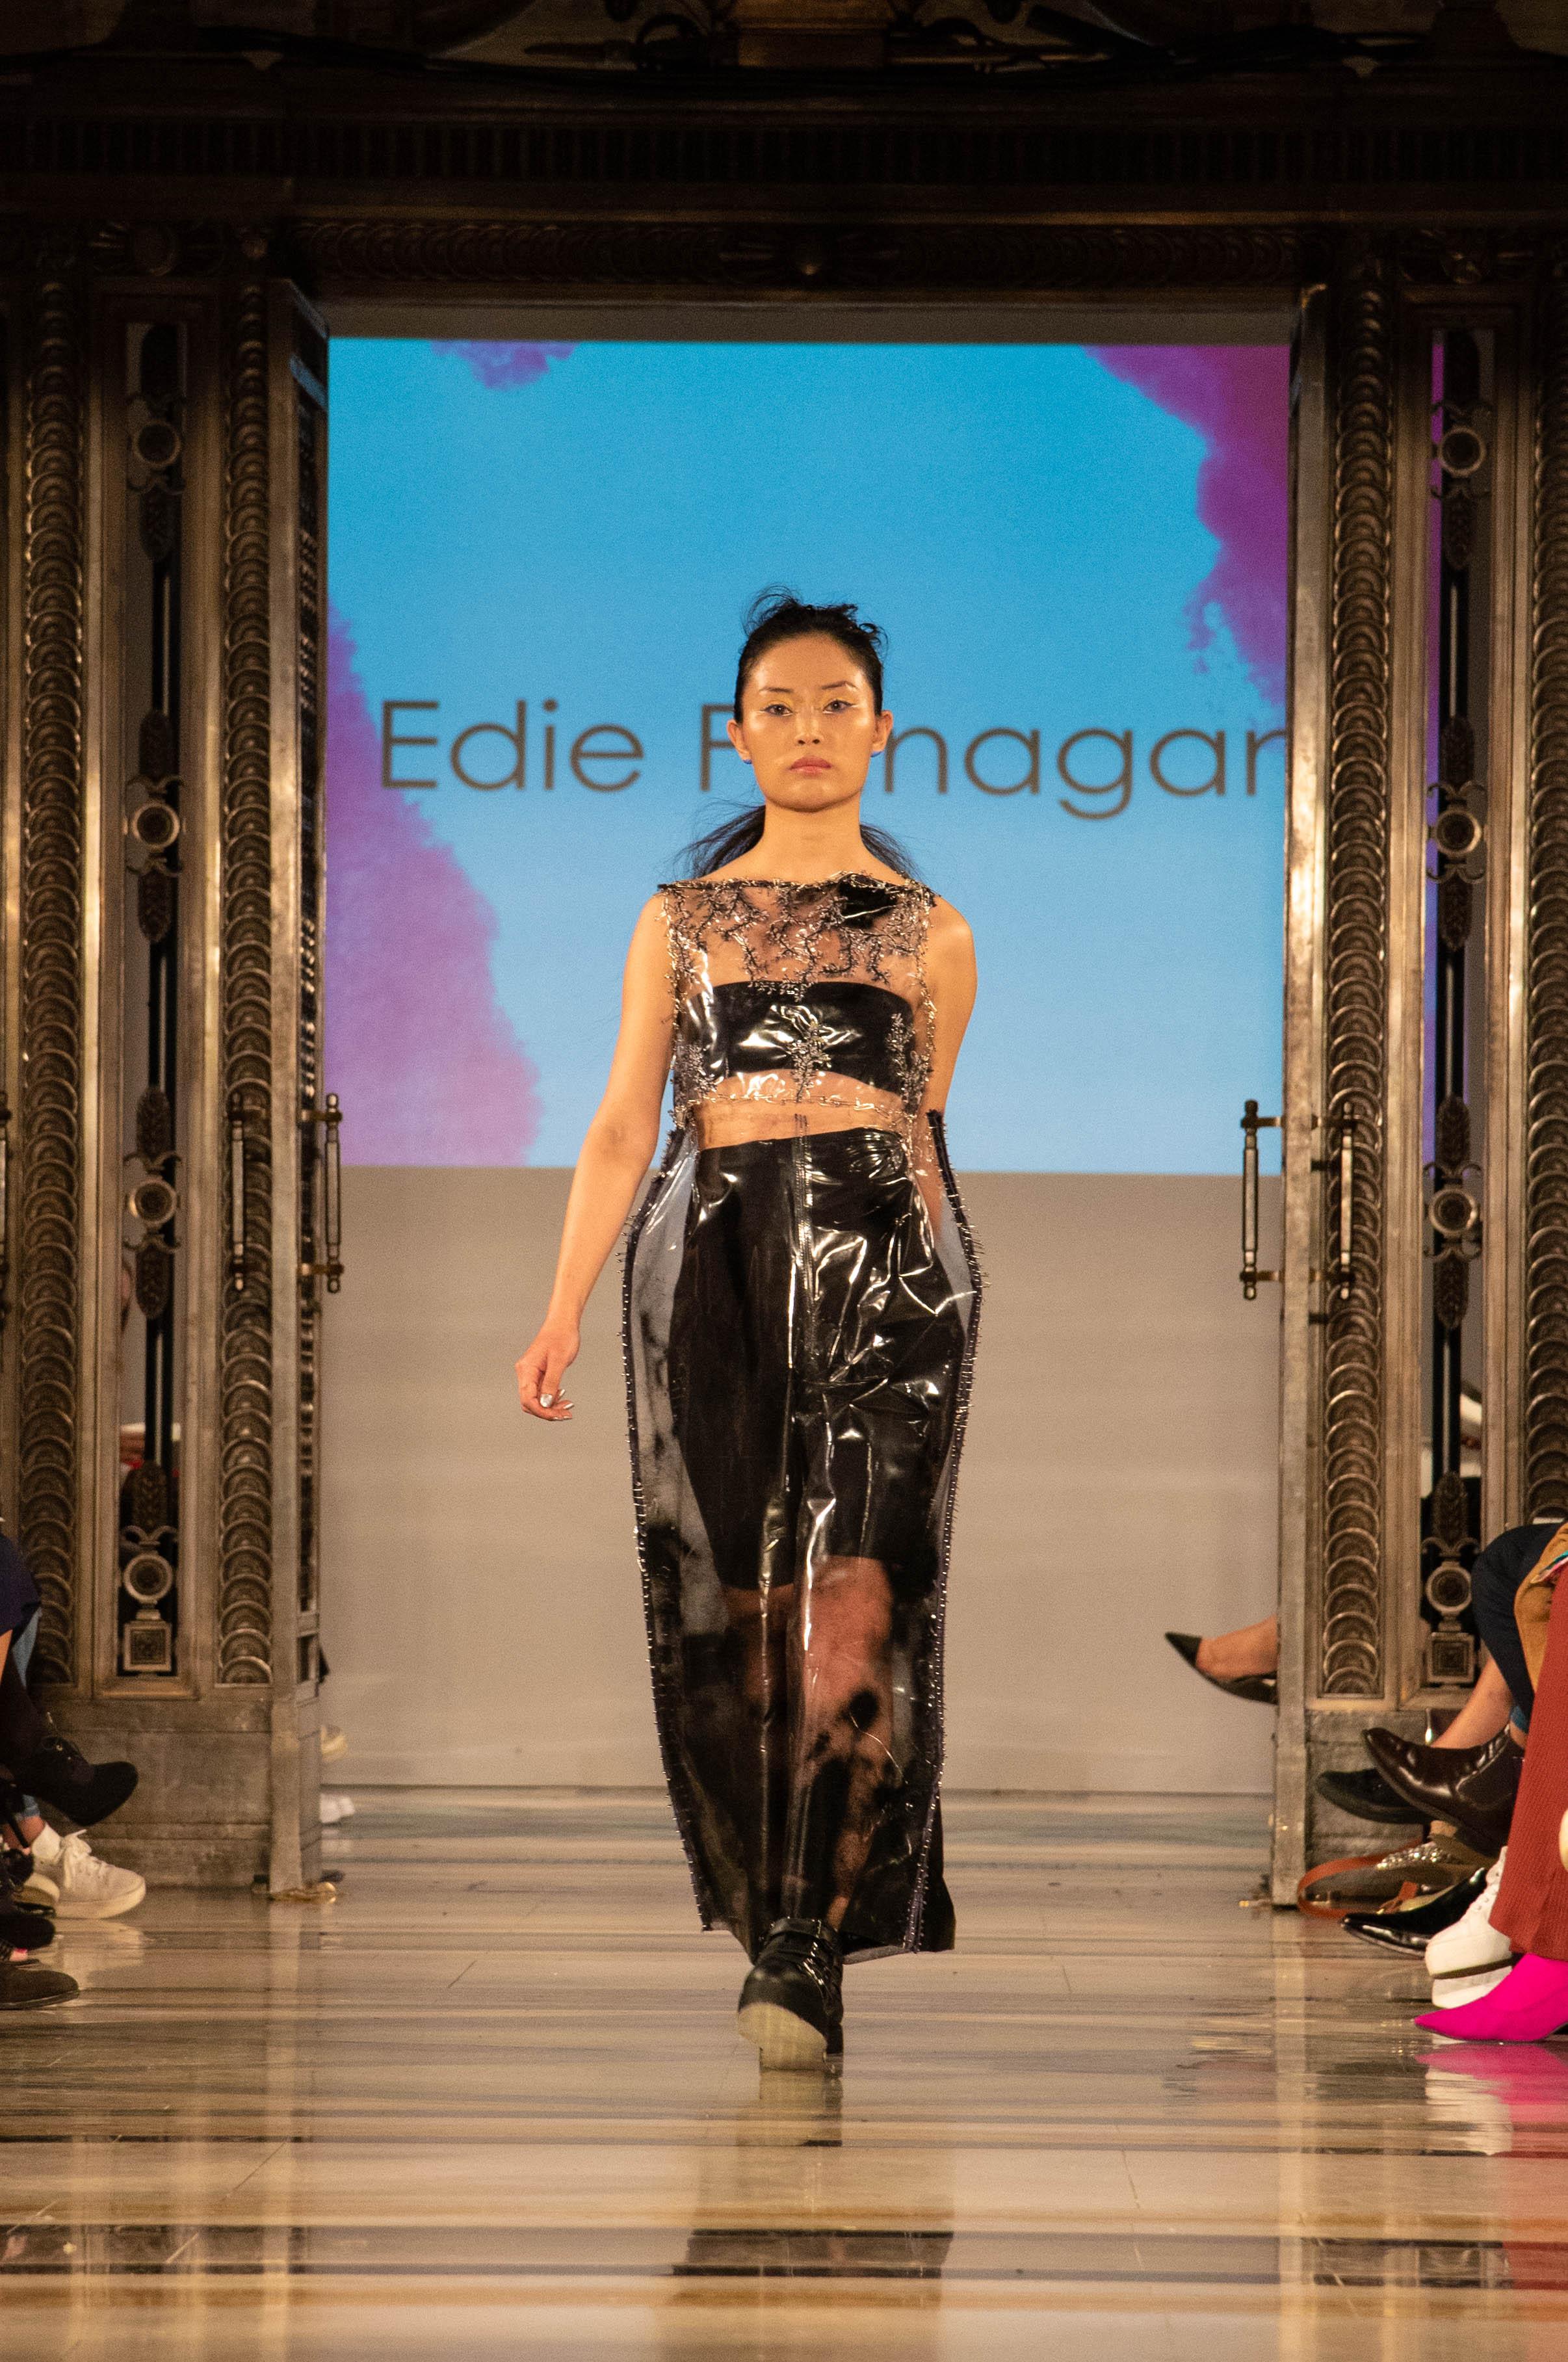 Edie Flanagan 1.jpg